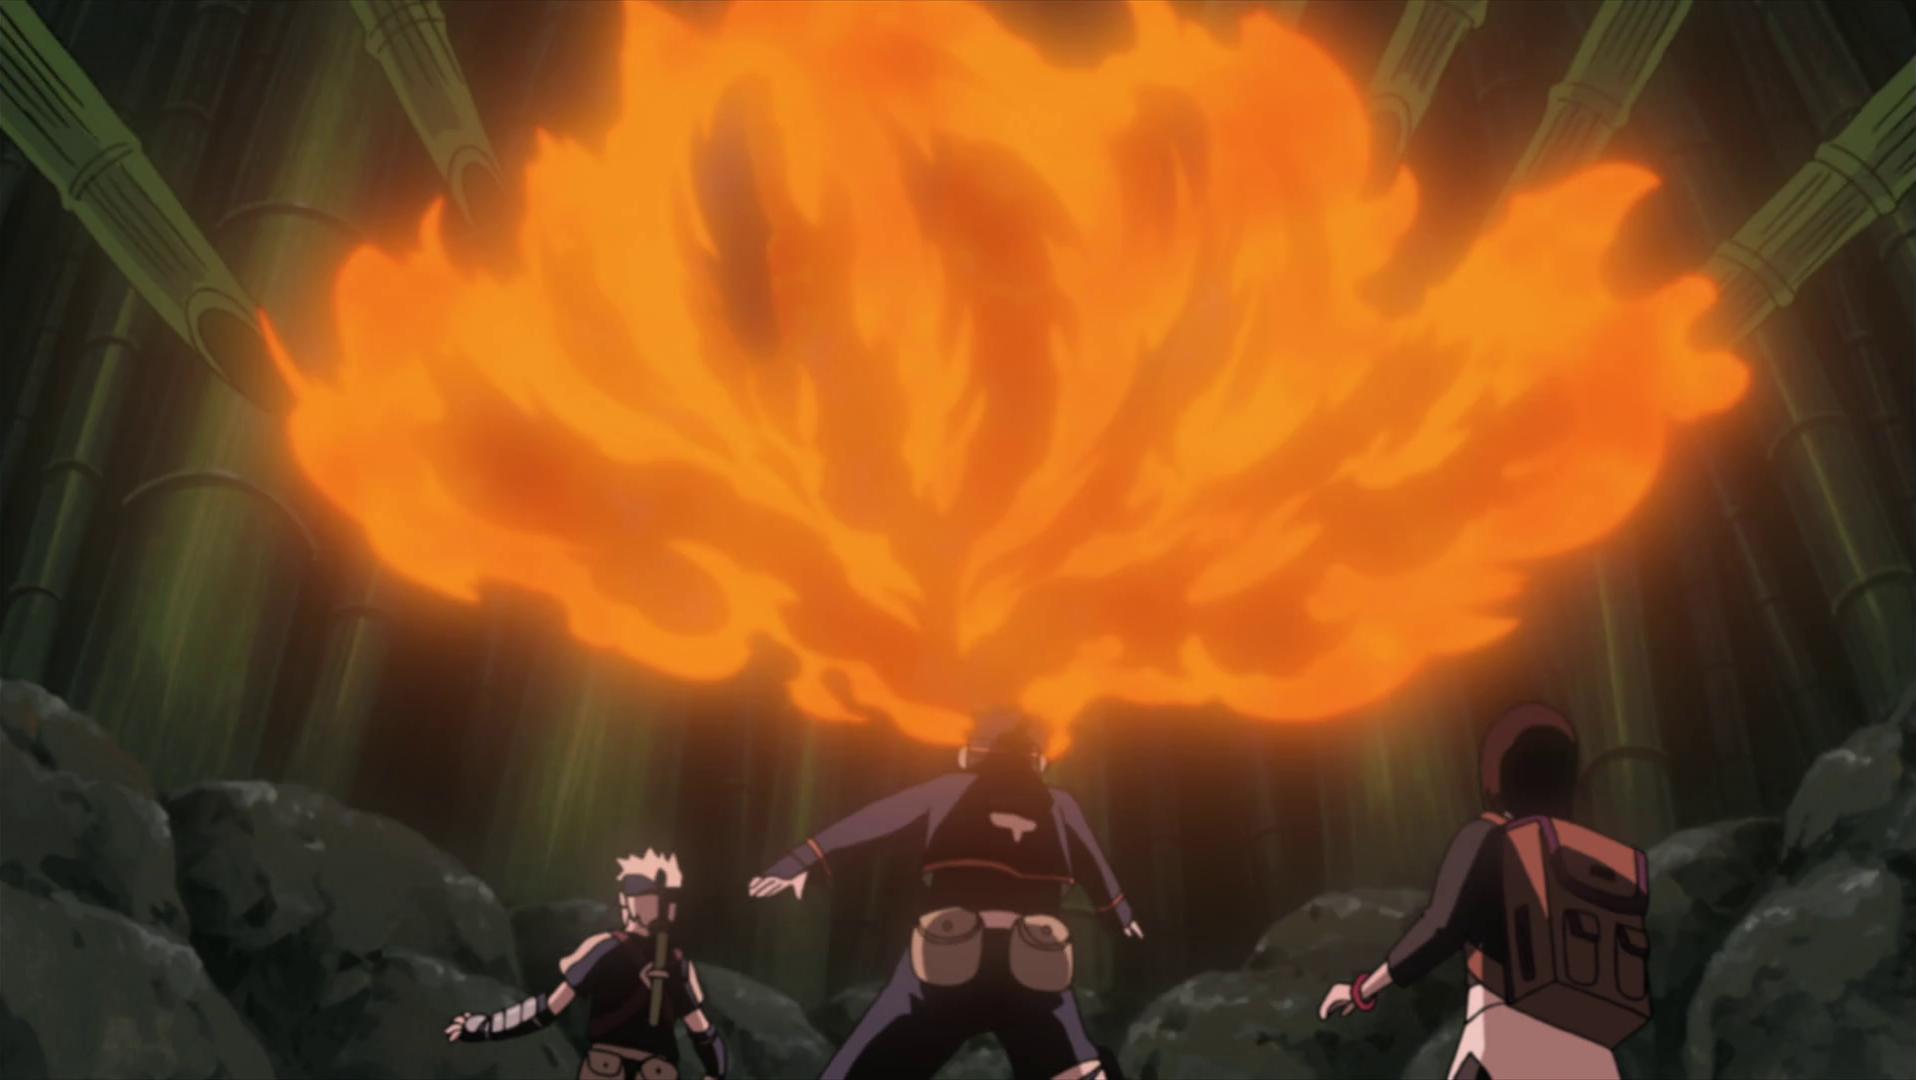 ~/~ Elementos ~/~ Obito_using_fire_technique